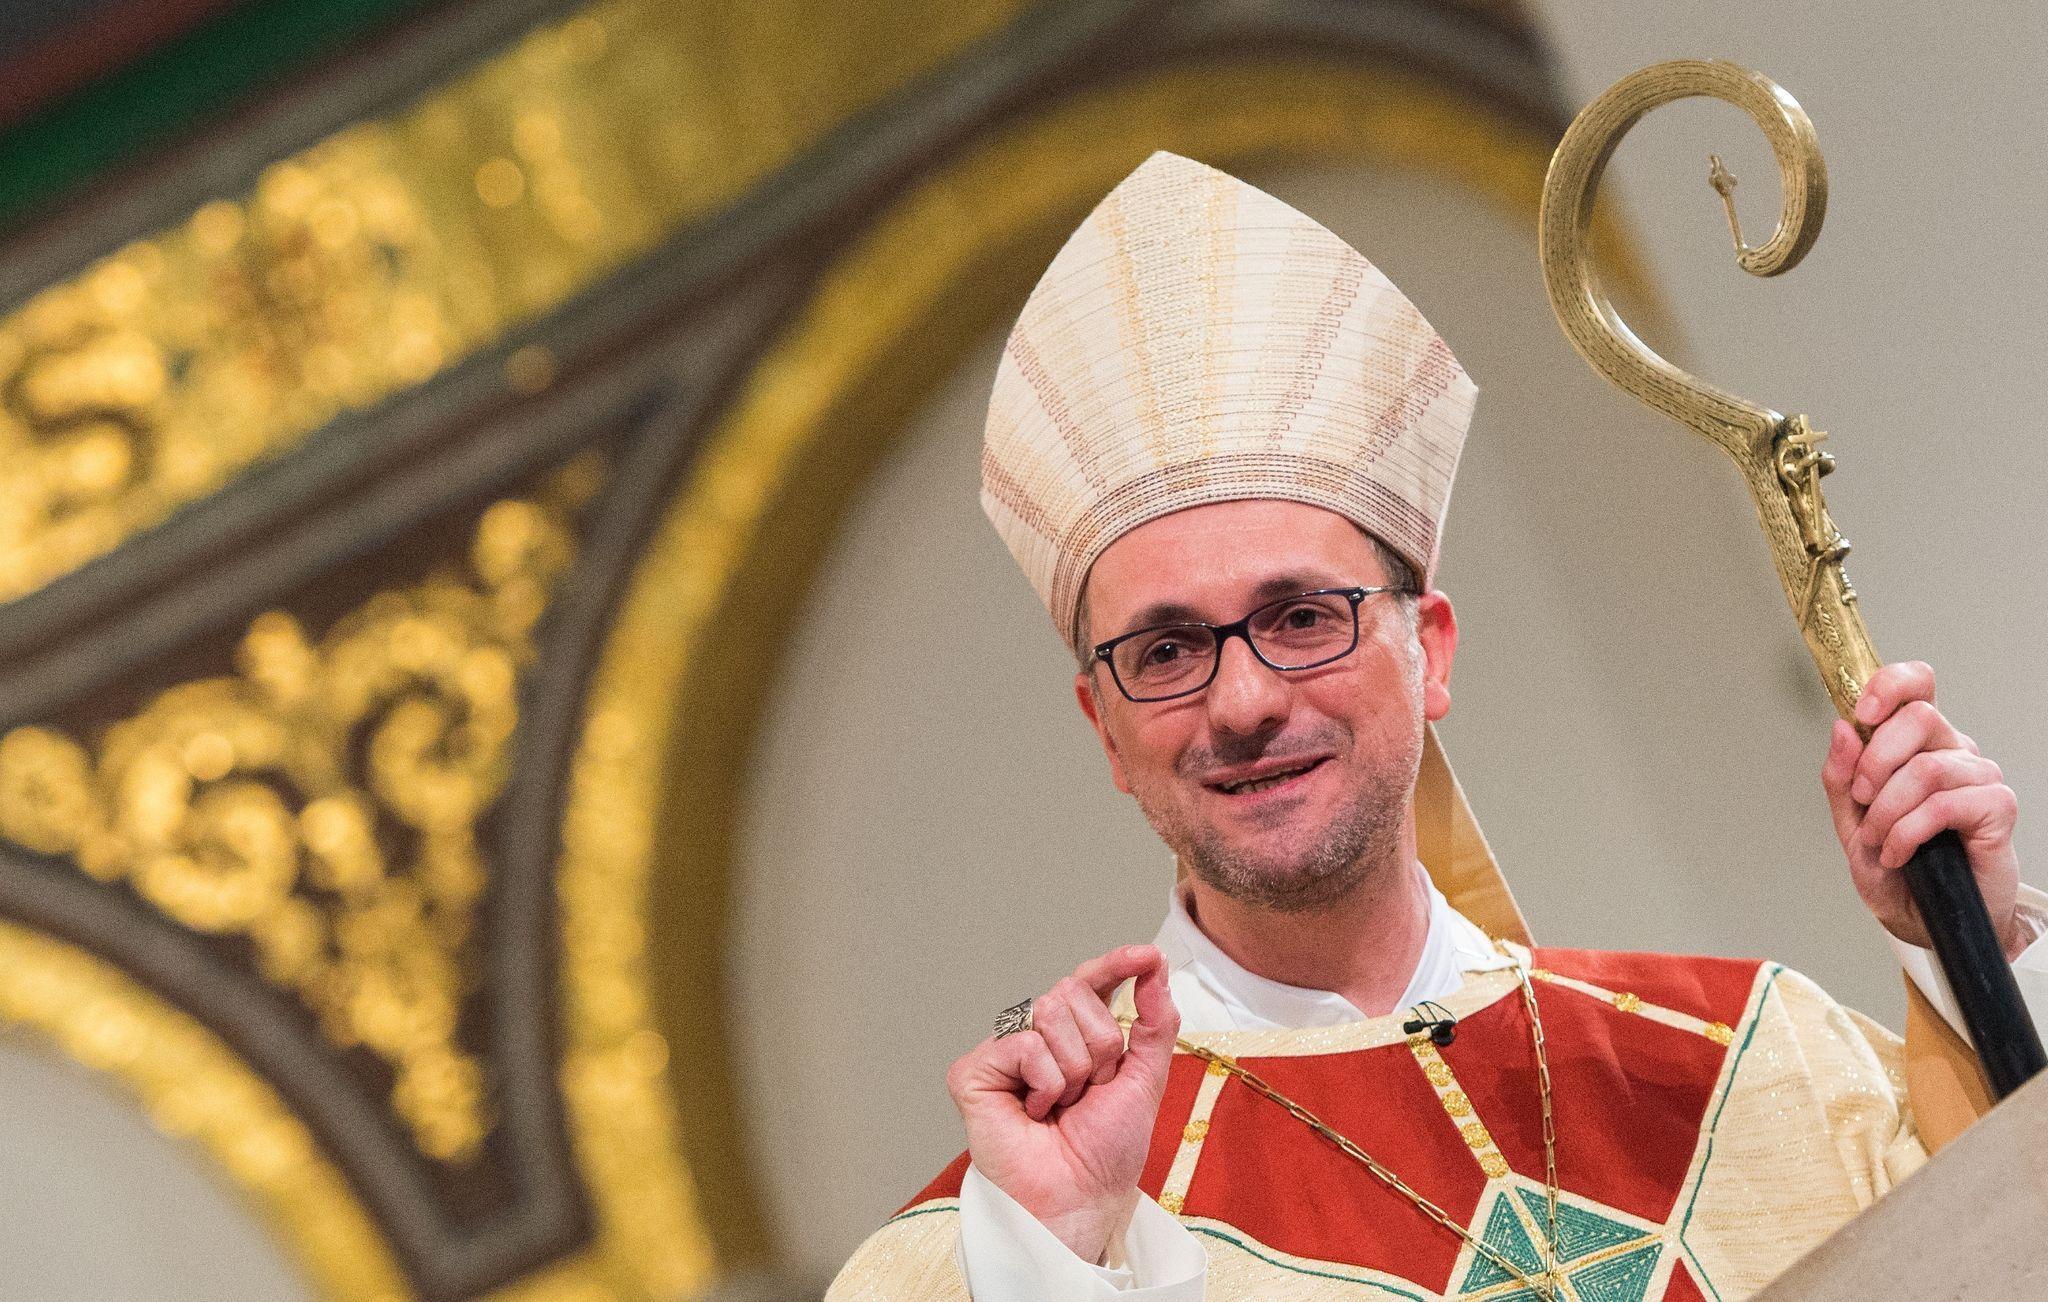 In der Kritik: Der Hamburger Erzbischof Stefan Heße. Foto: dpa/Bockwoldt